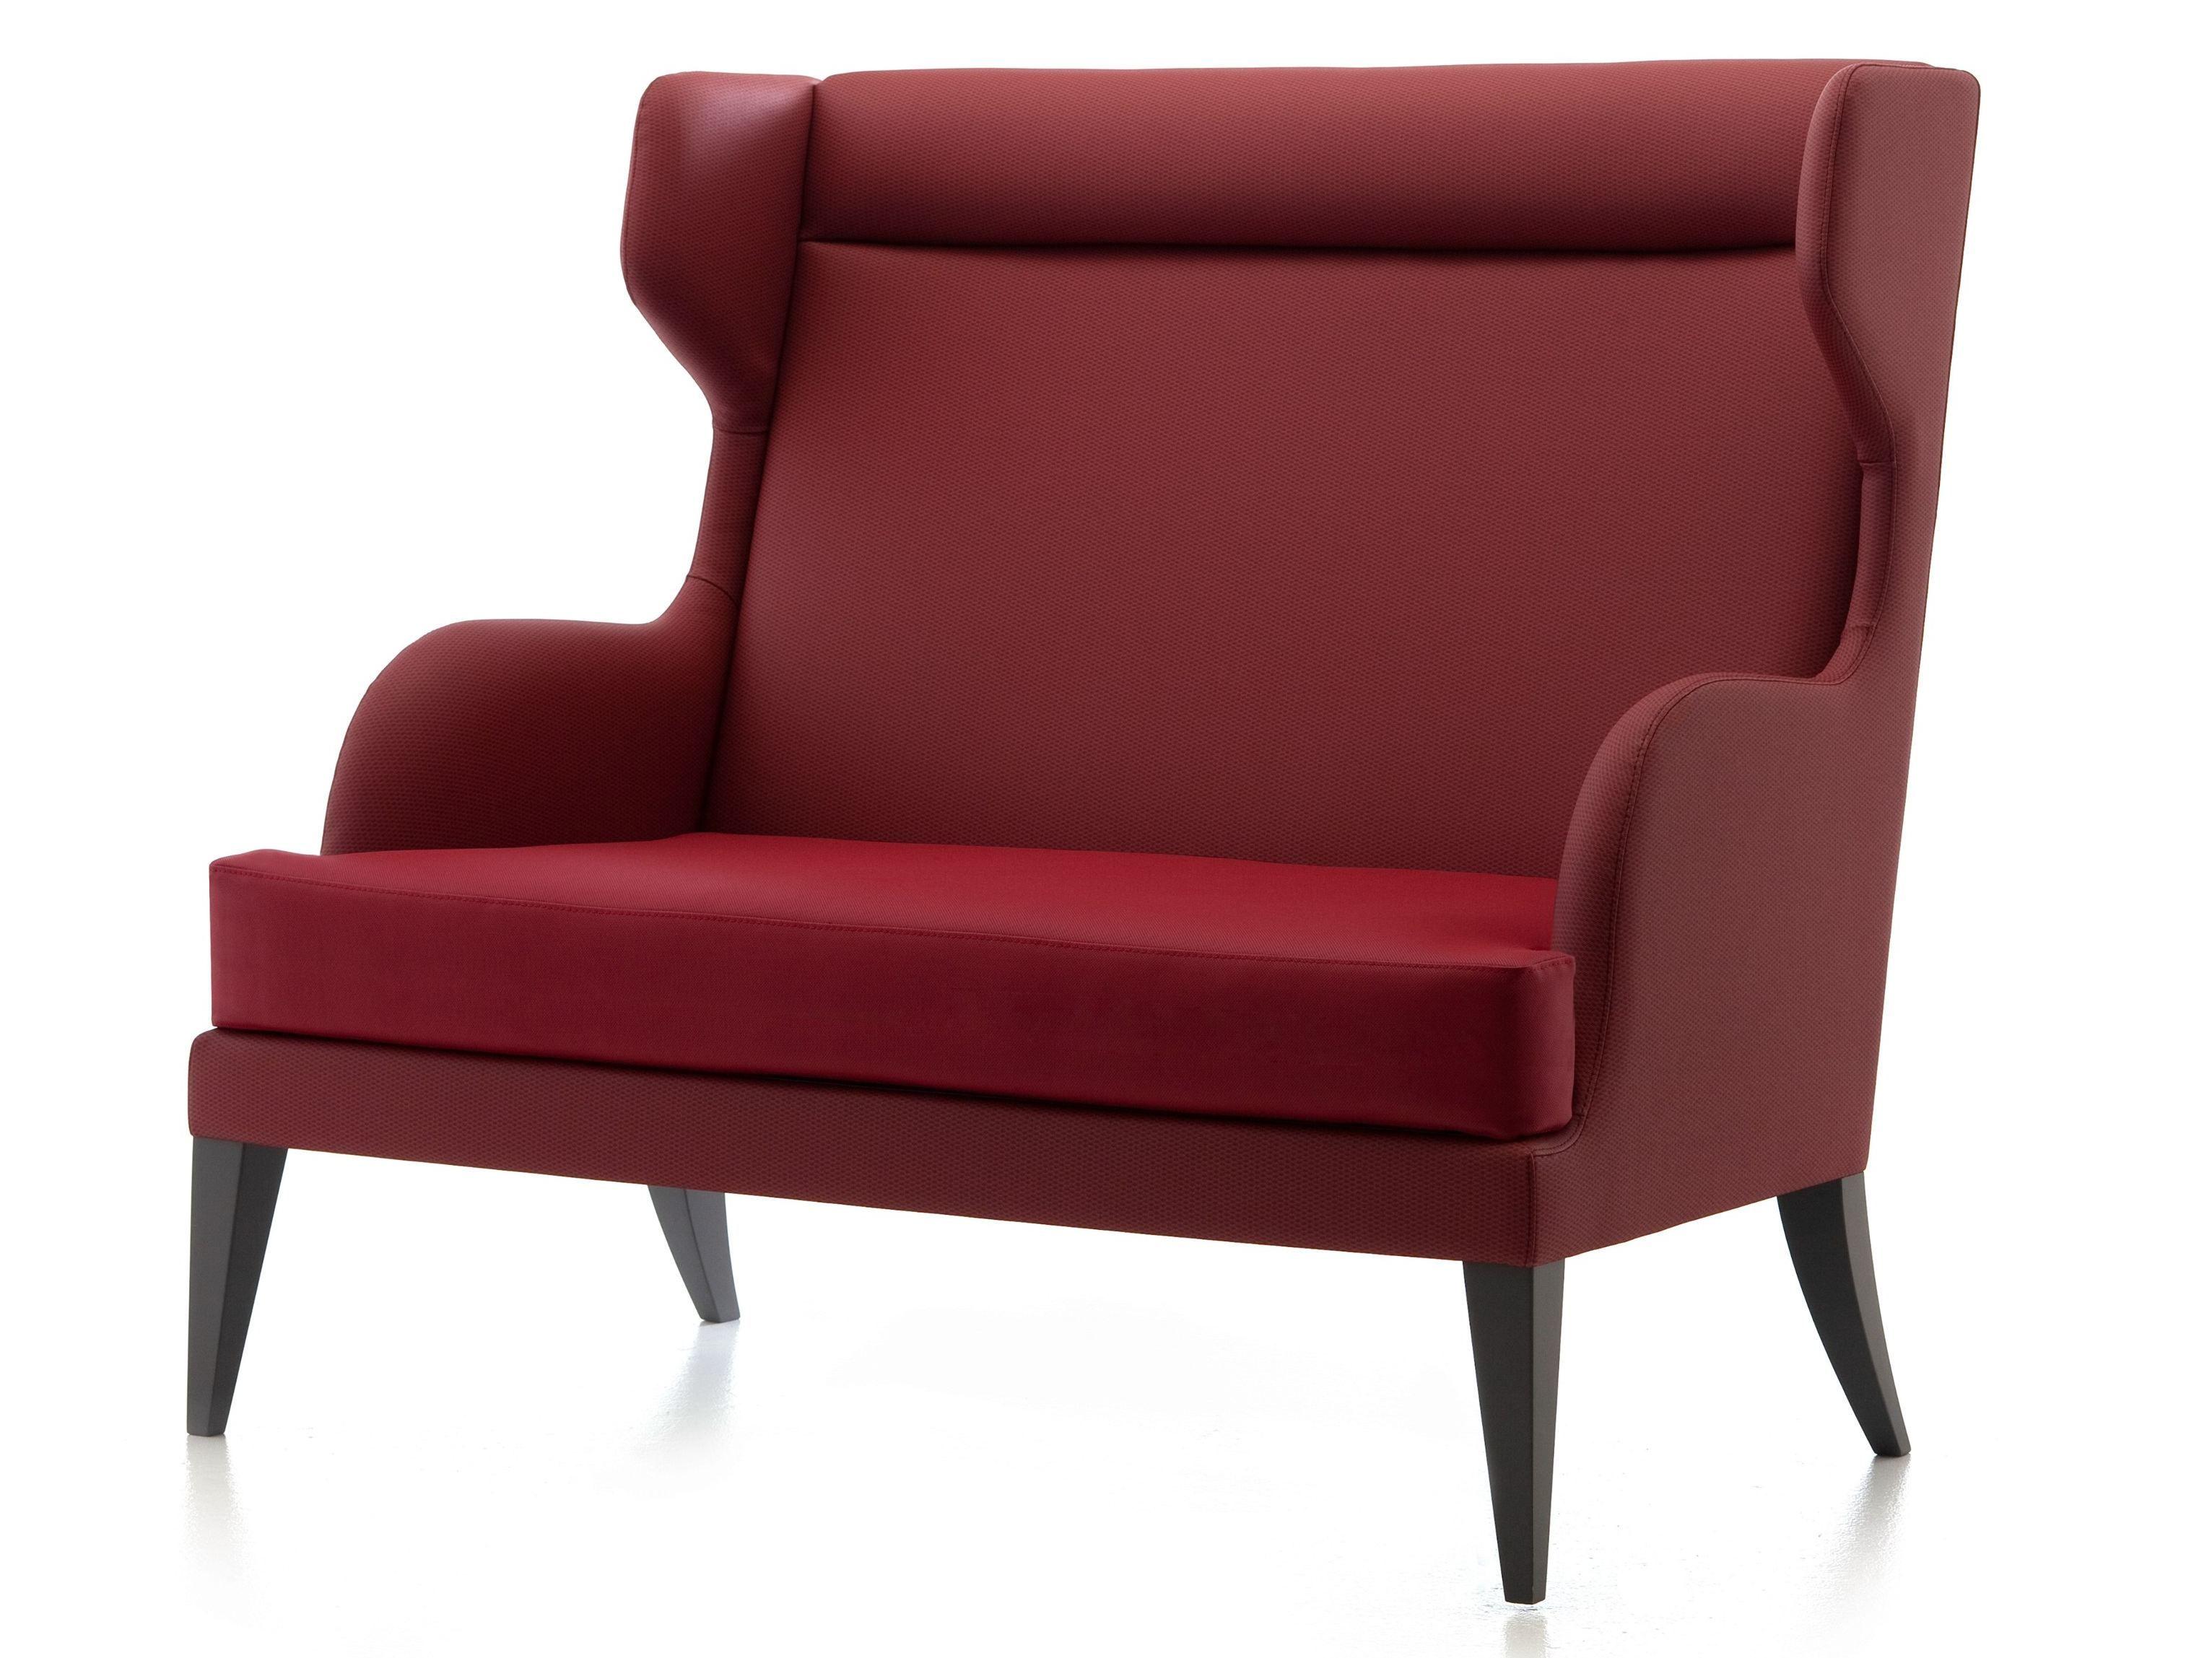 2 er sofa mit hoher r ckenlehne kollektion onda by very wood design werther toffoloni. Black Bedroom Furniture Sets. Home Design Ideas